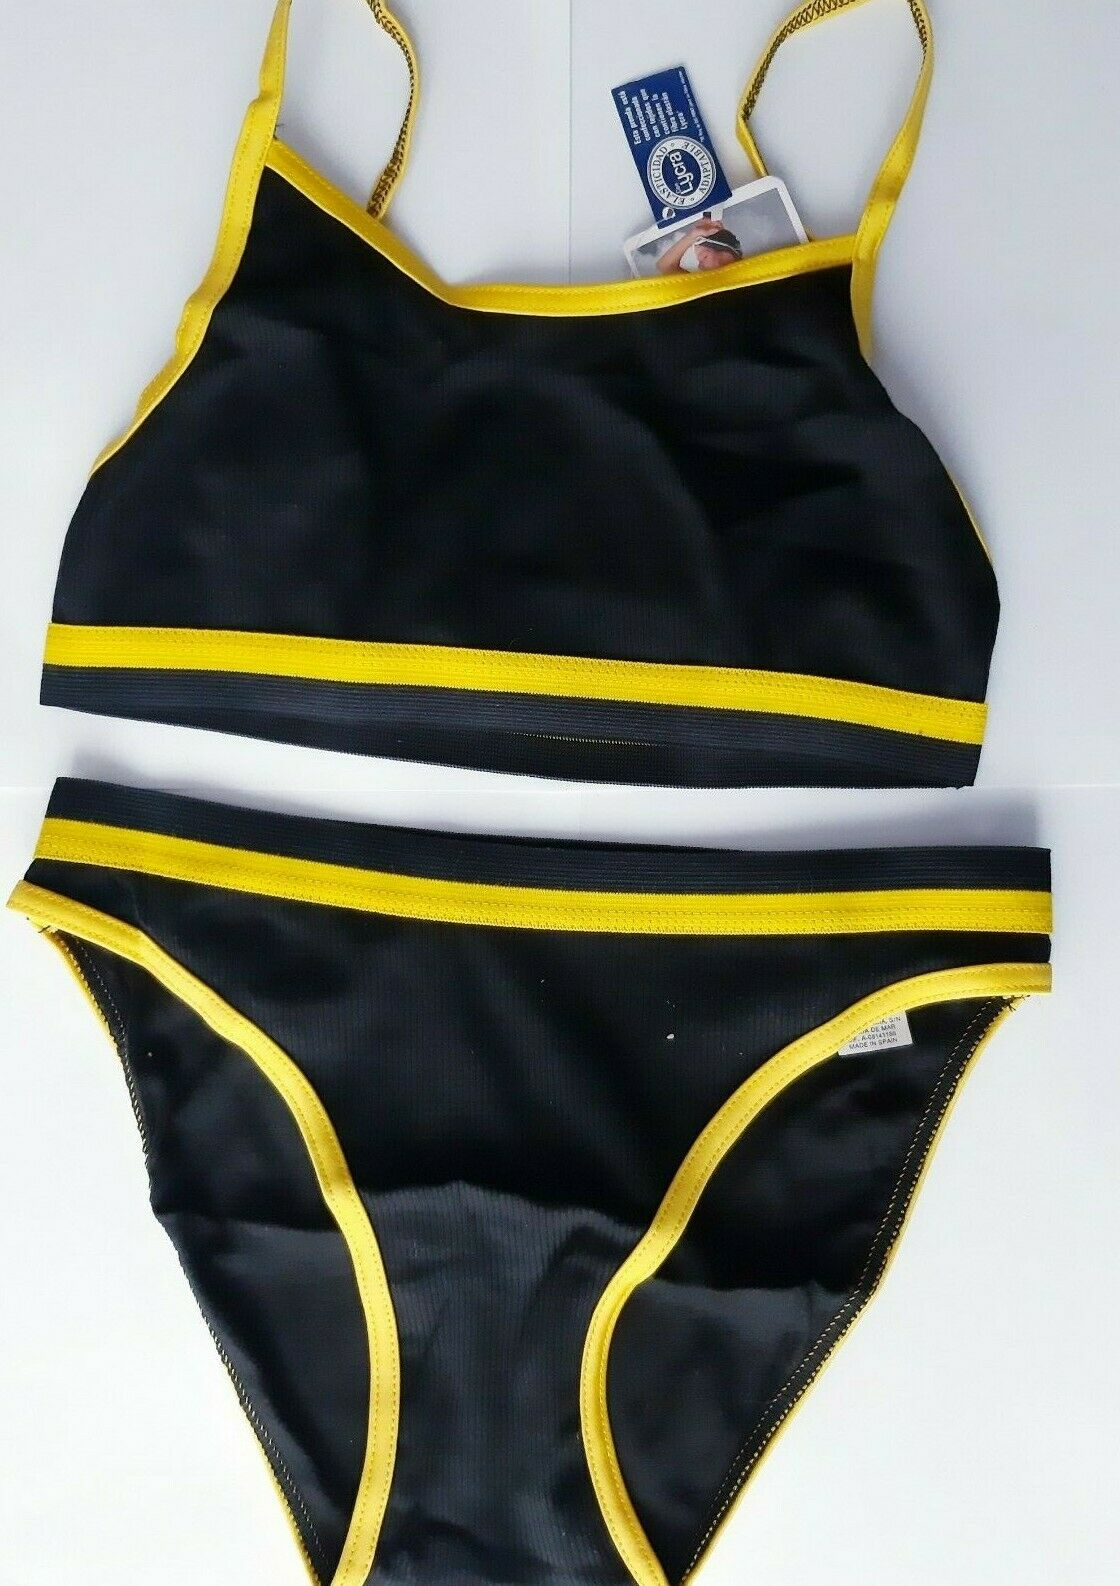 Bikini mujer Vintage talla 40 bañador verano negro playa baño